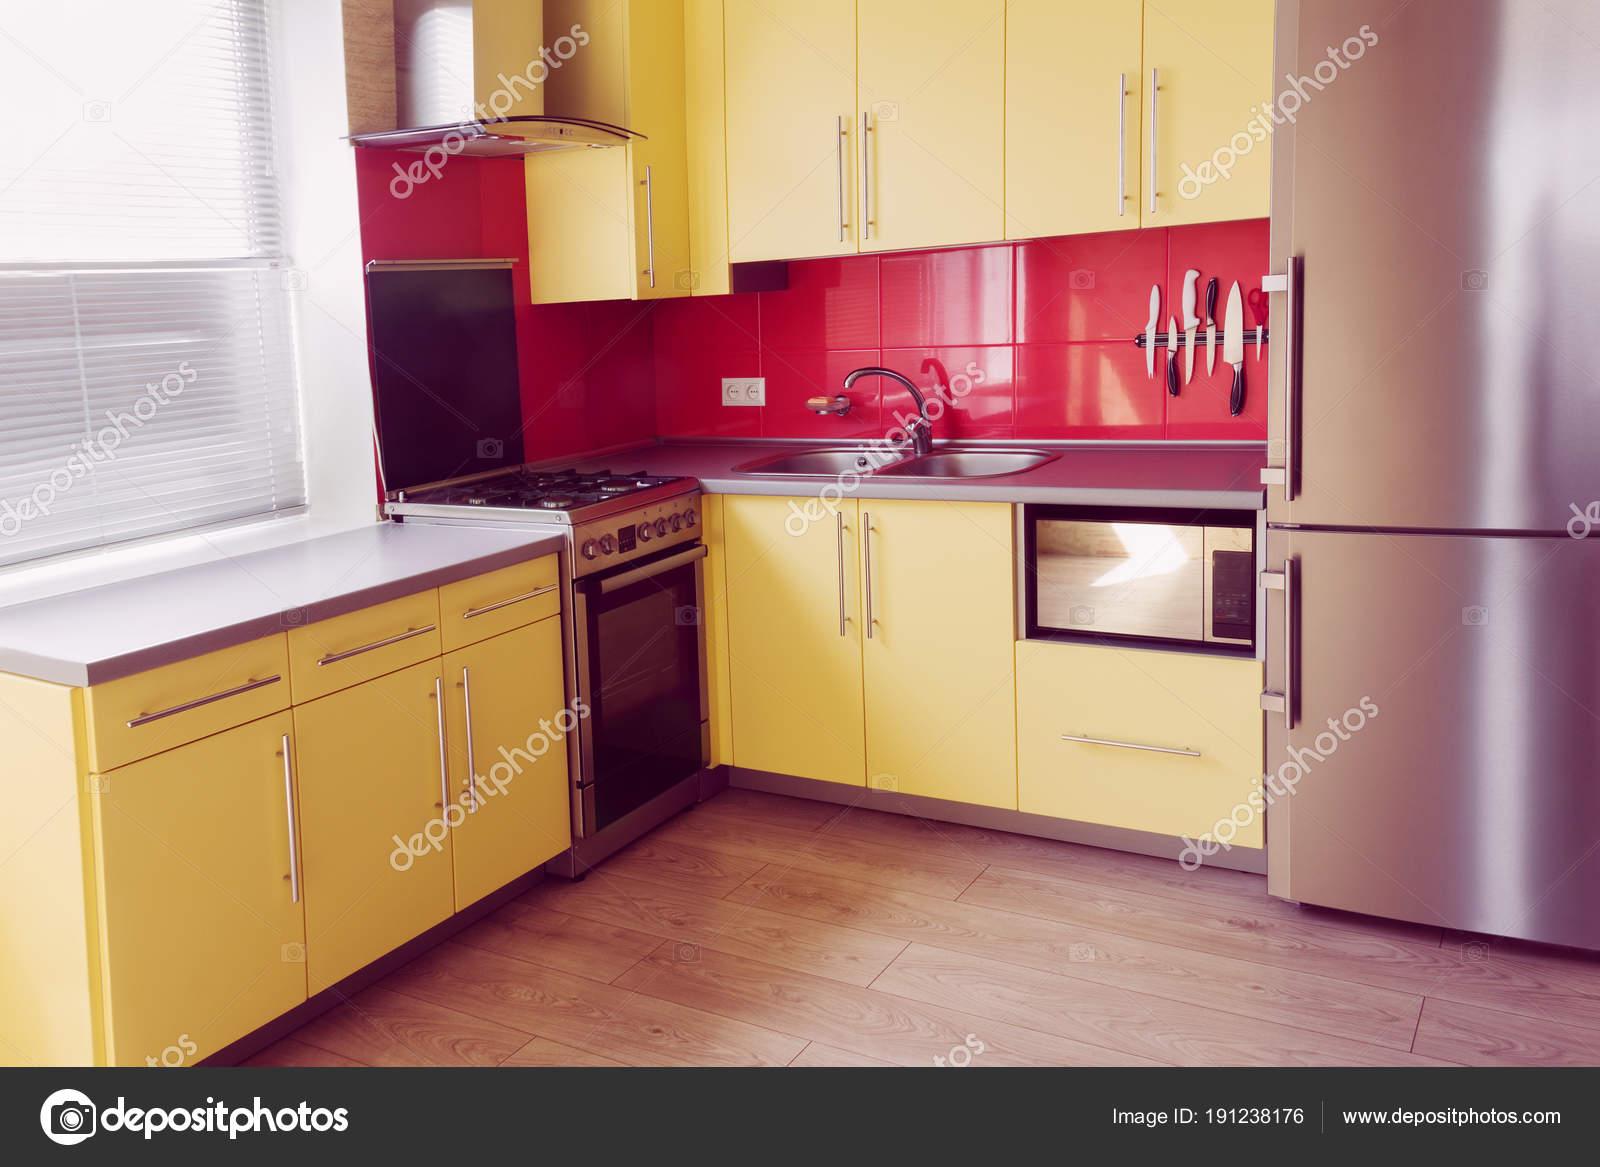 gelbe Küche — Stockfoto © Angelika #191238176